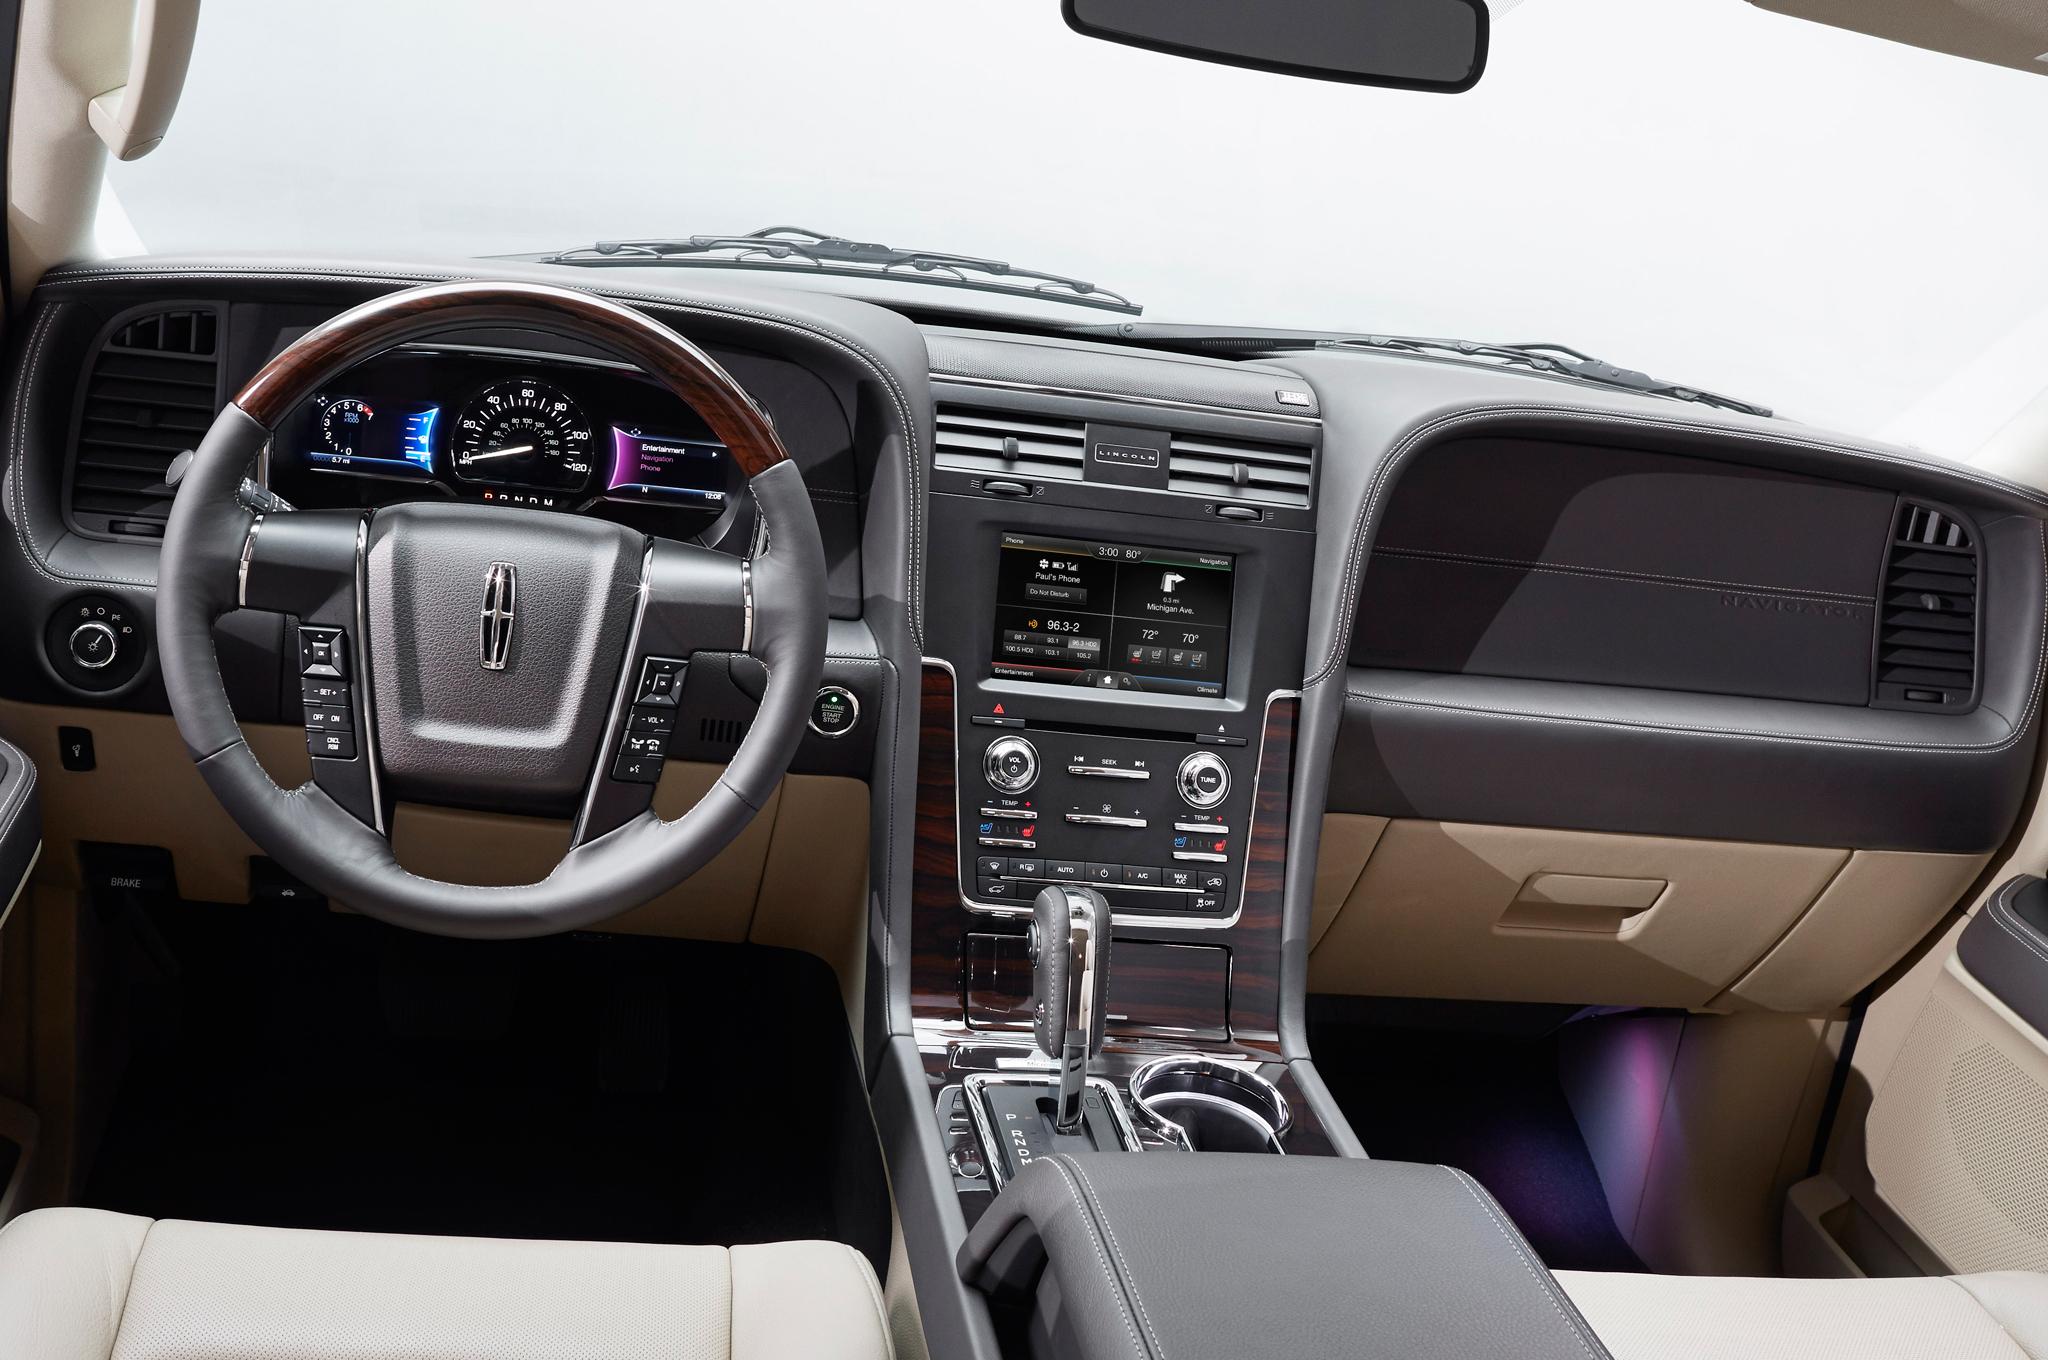 2015 Lincoln Navigator Dashboard Panel and Head Unit